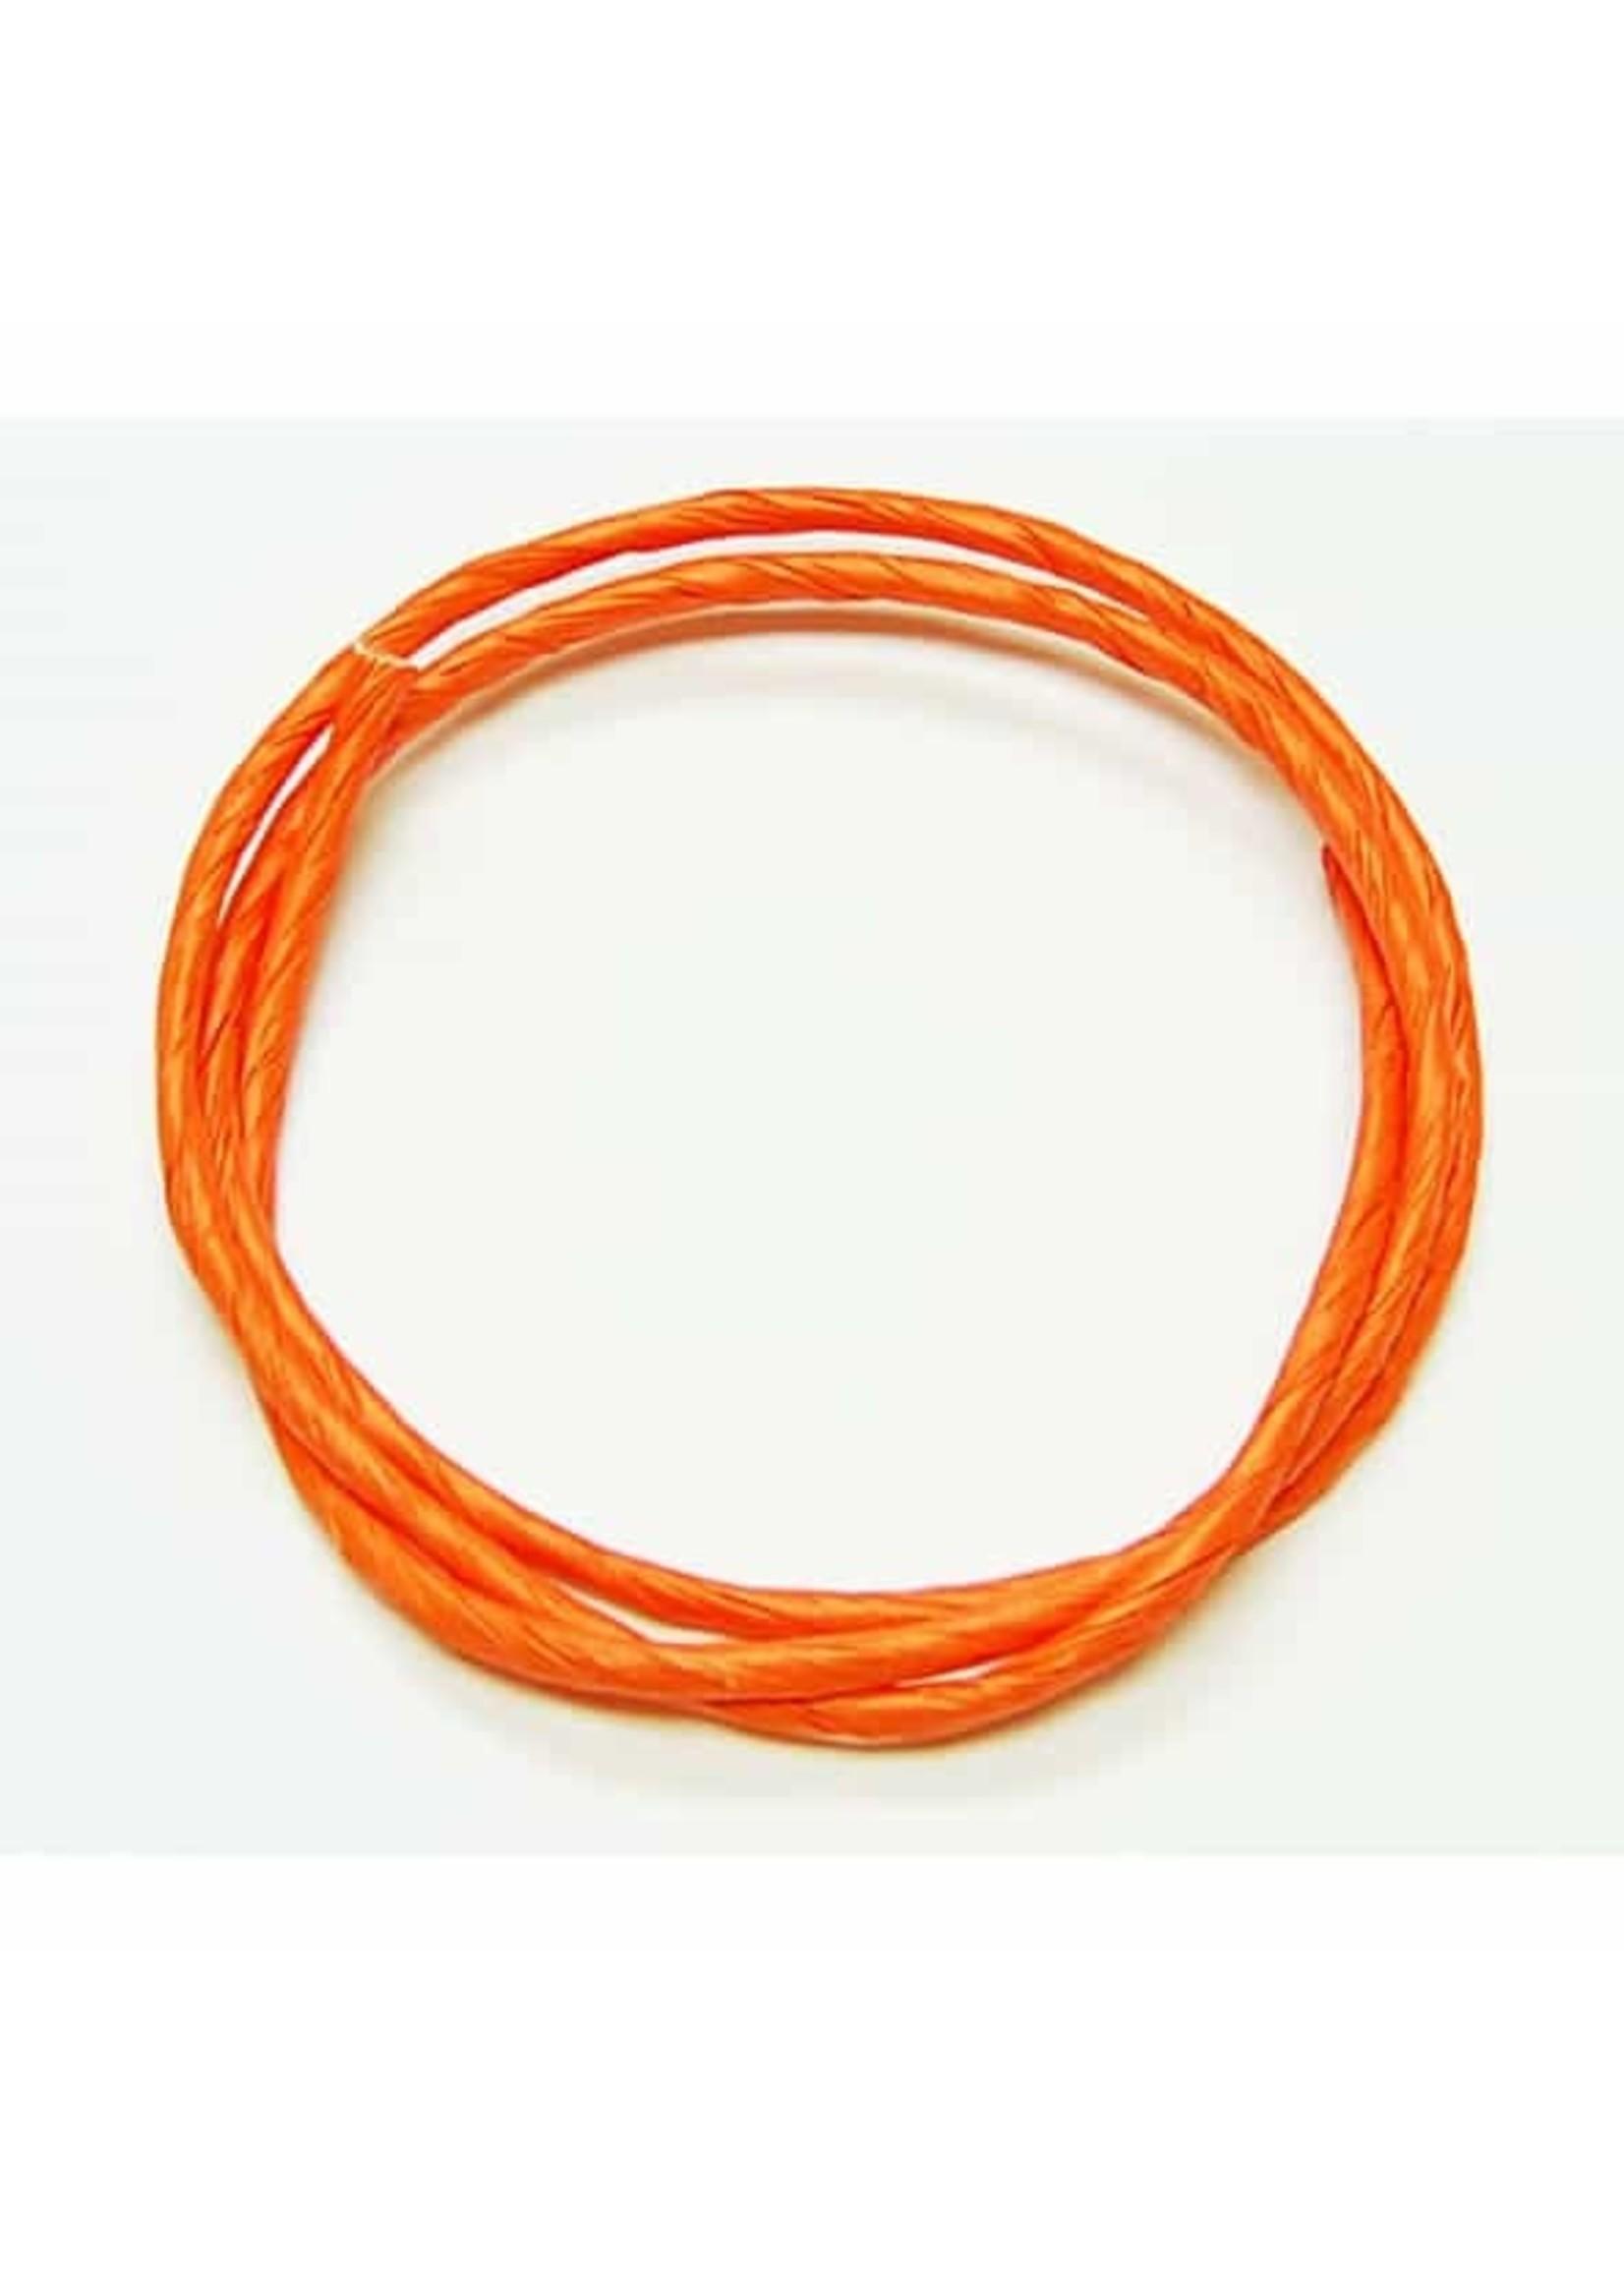 "Zoo-Max Zoo Max Orange Paper Rope (.125 x 1/4"")"